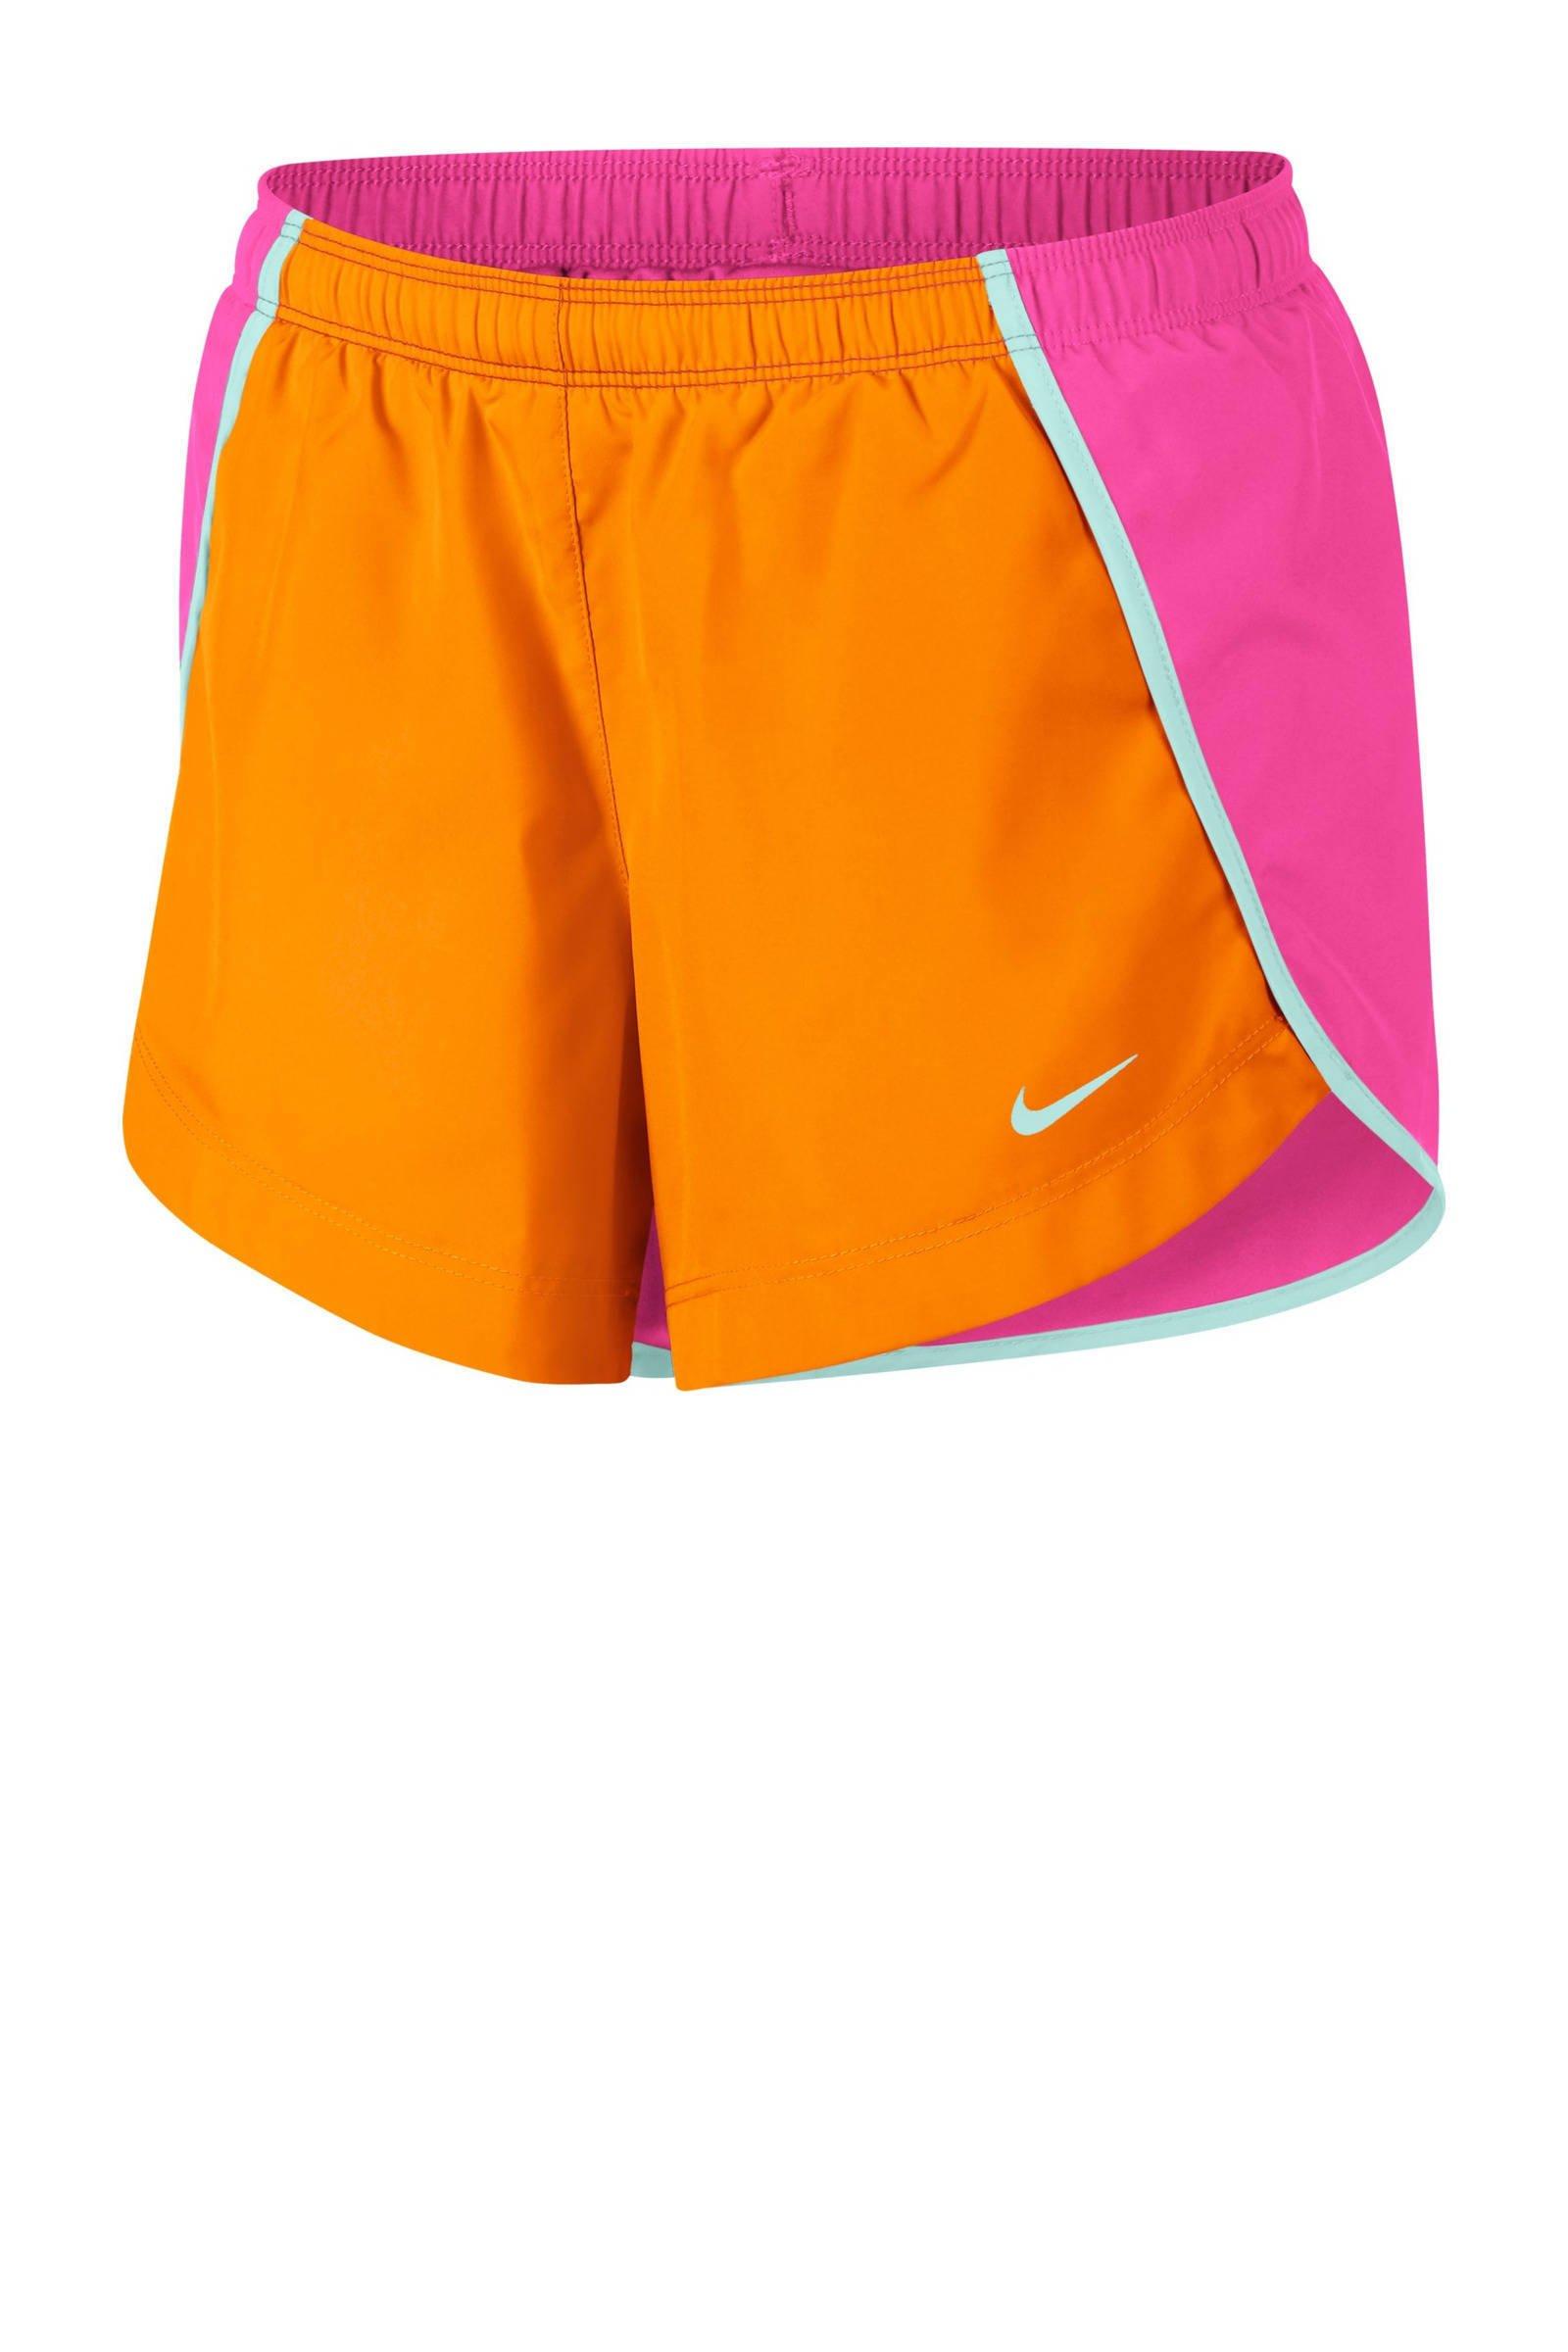 8544ef195df Nike short oranje/roze   wehkamp